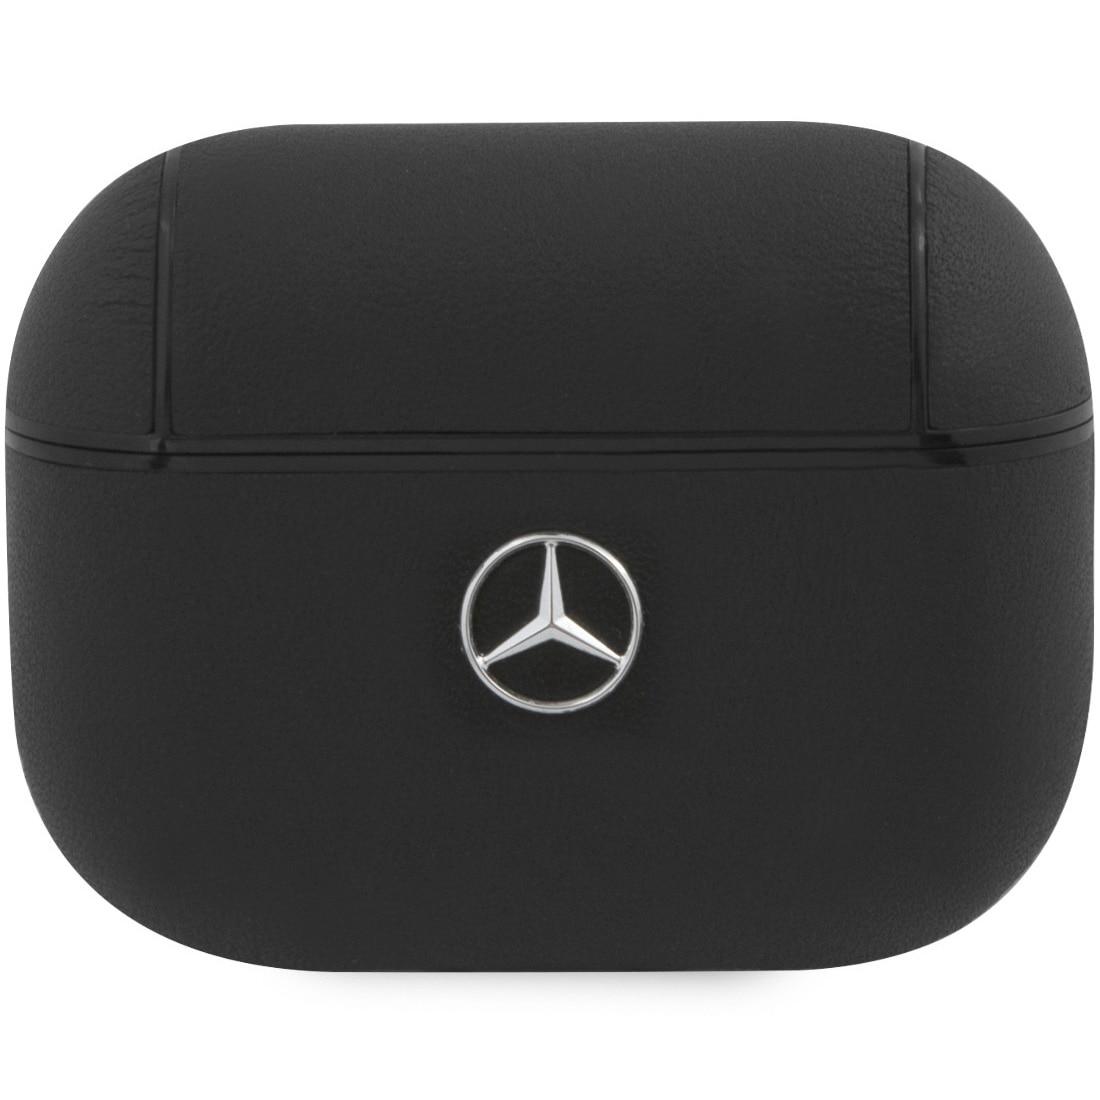 Fotografie Husa Airpods Mercedes Leather MEAPCSLBK pentru Airpods Pro, Black